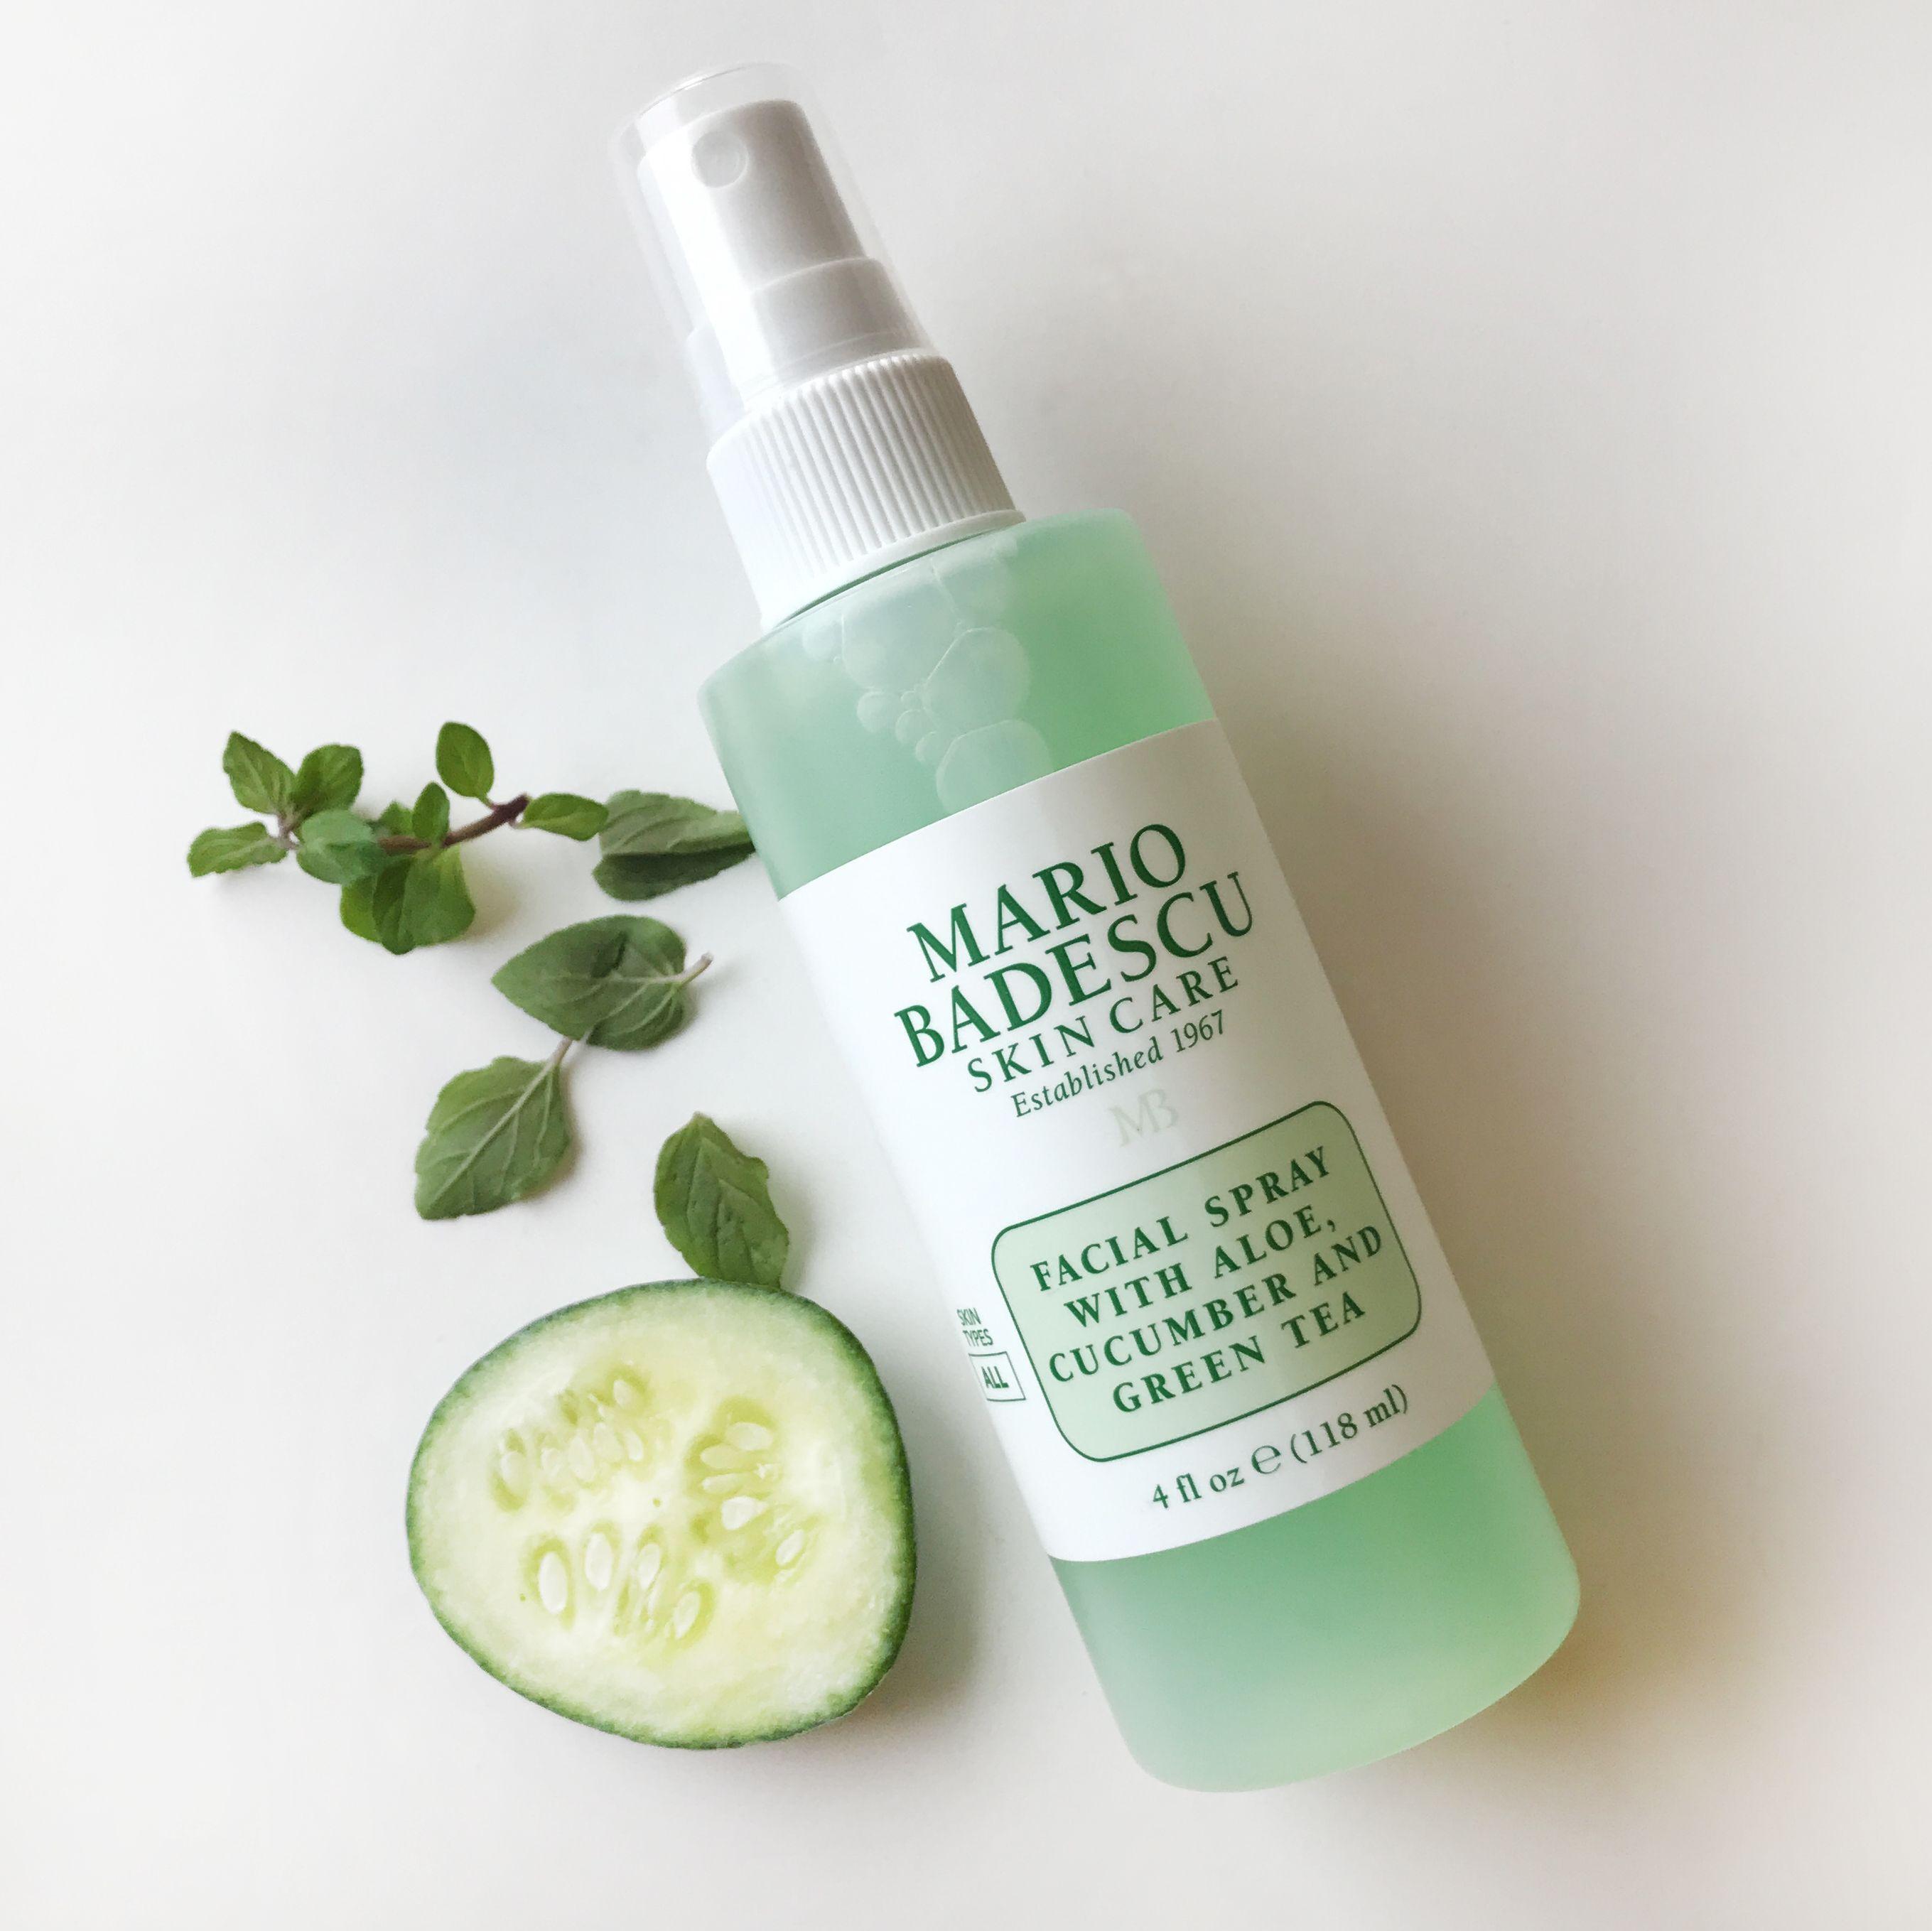 Facial Spray With Aloe Cucumber And Green Tea Skin Care